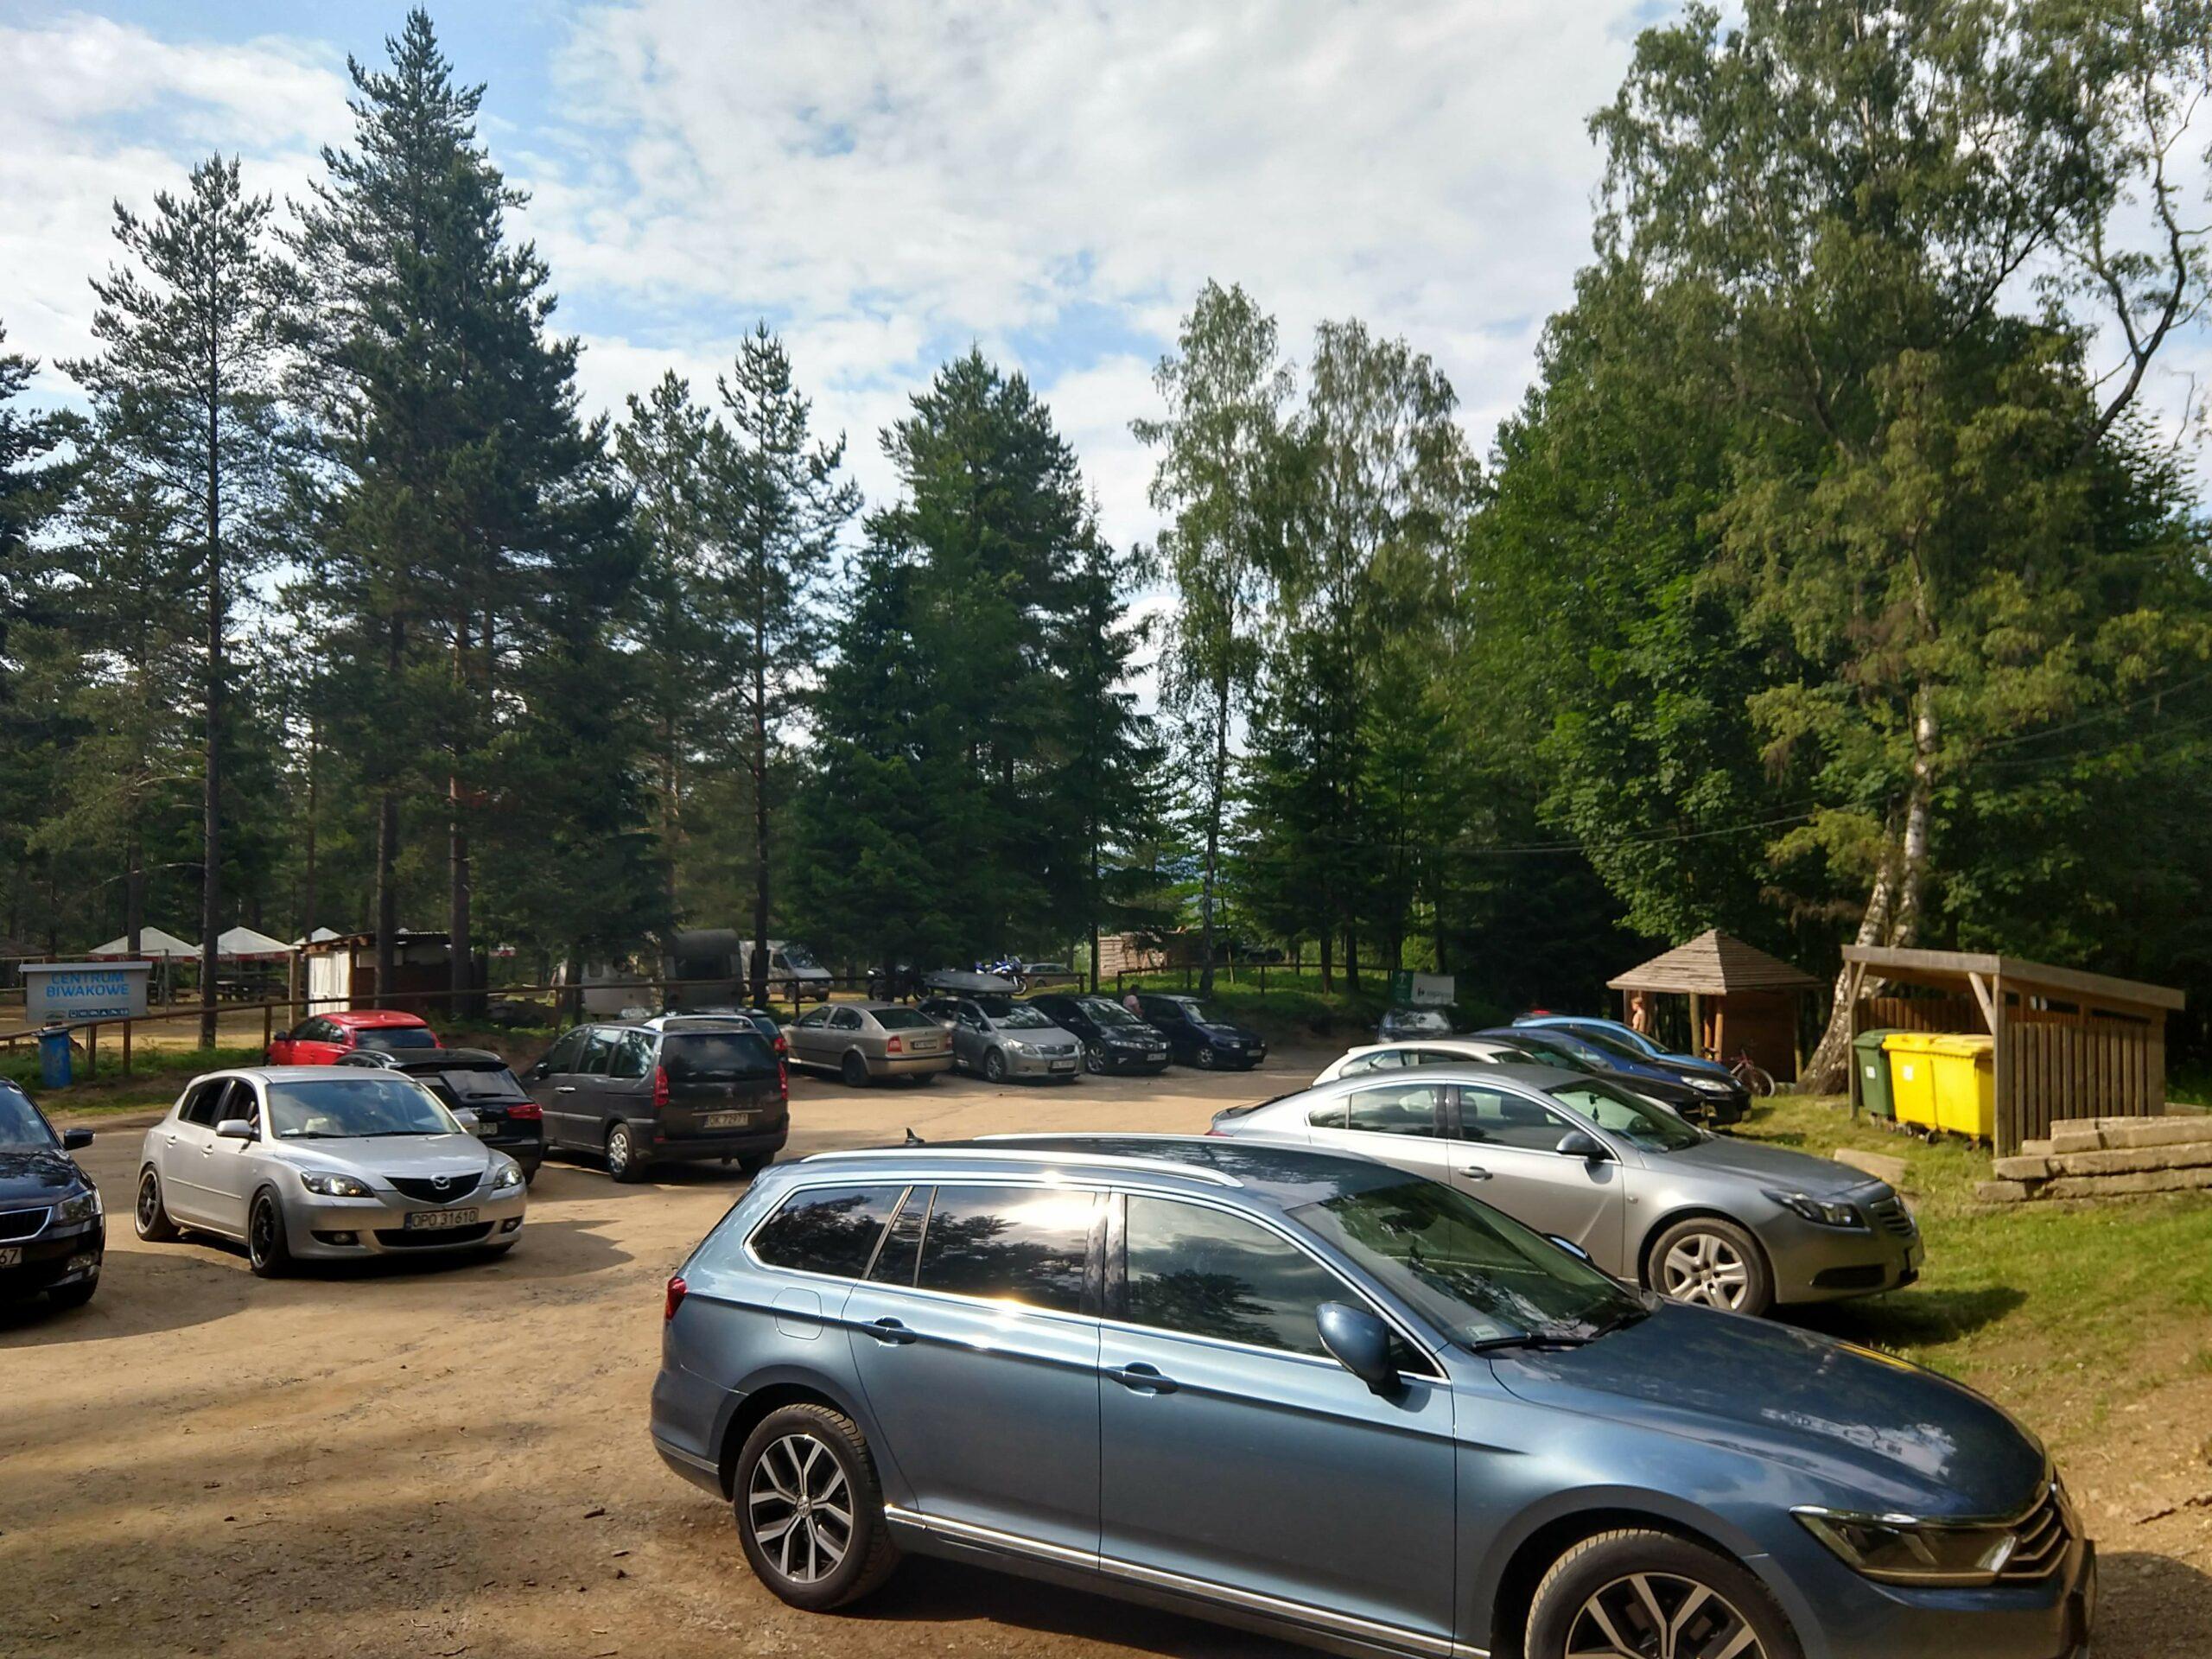 Kolorowe Jeziorka parking